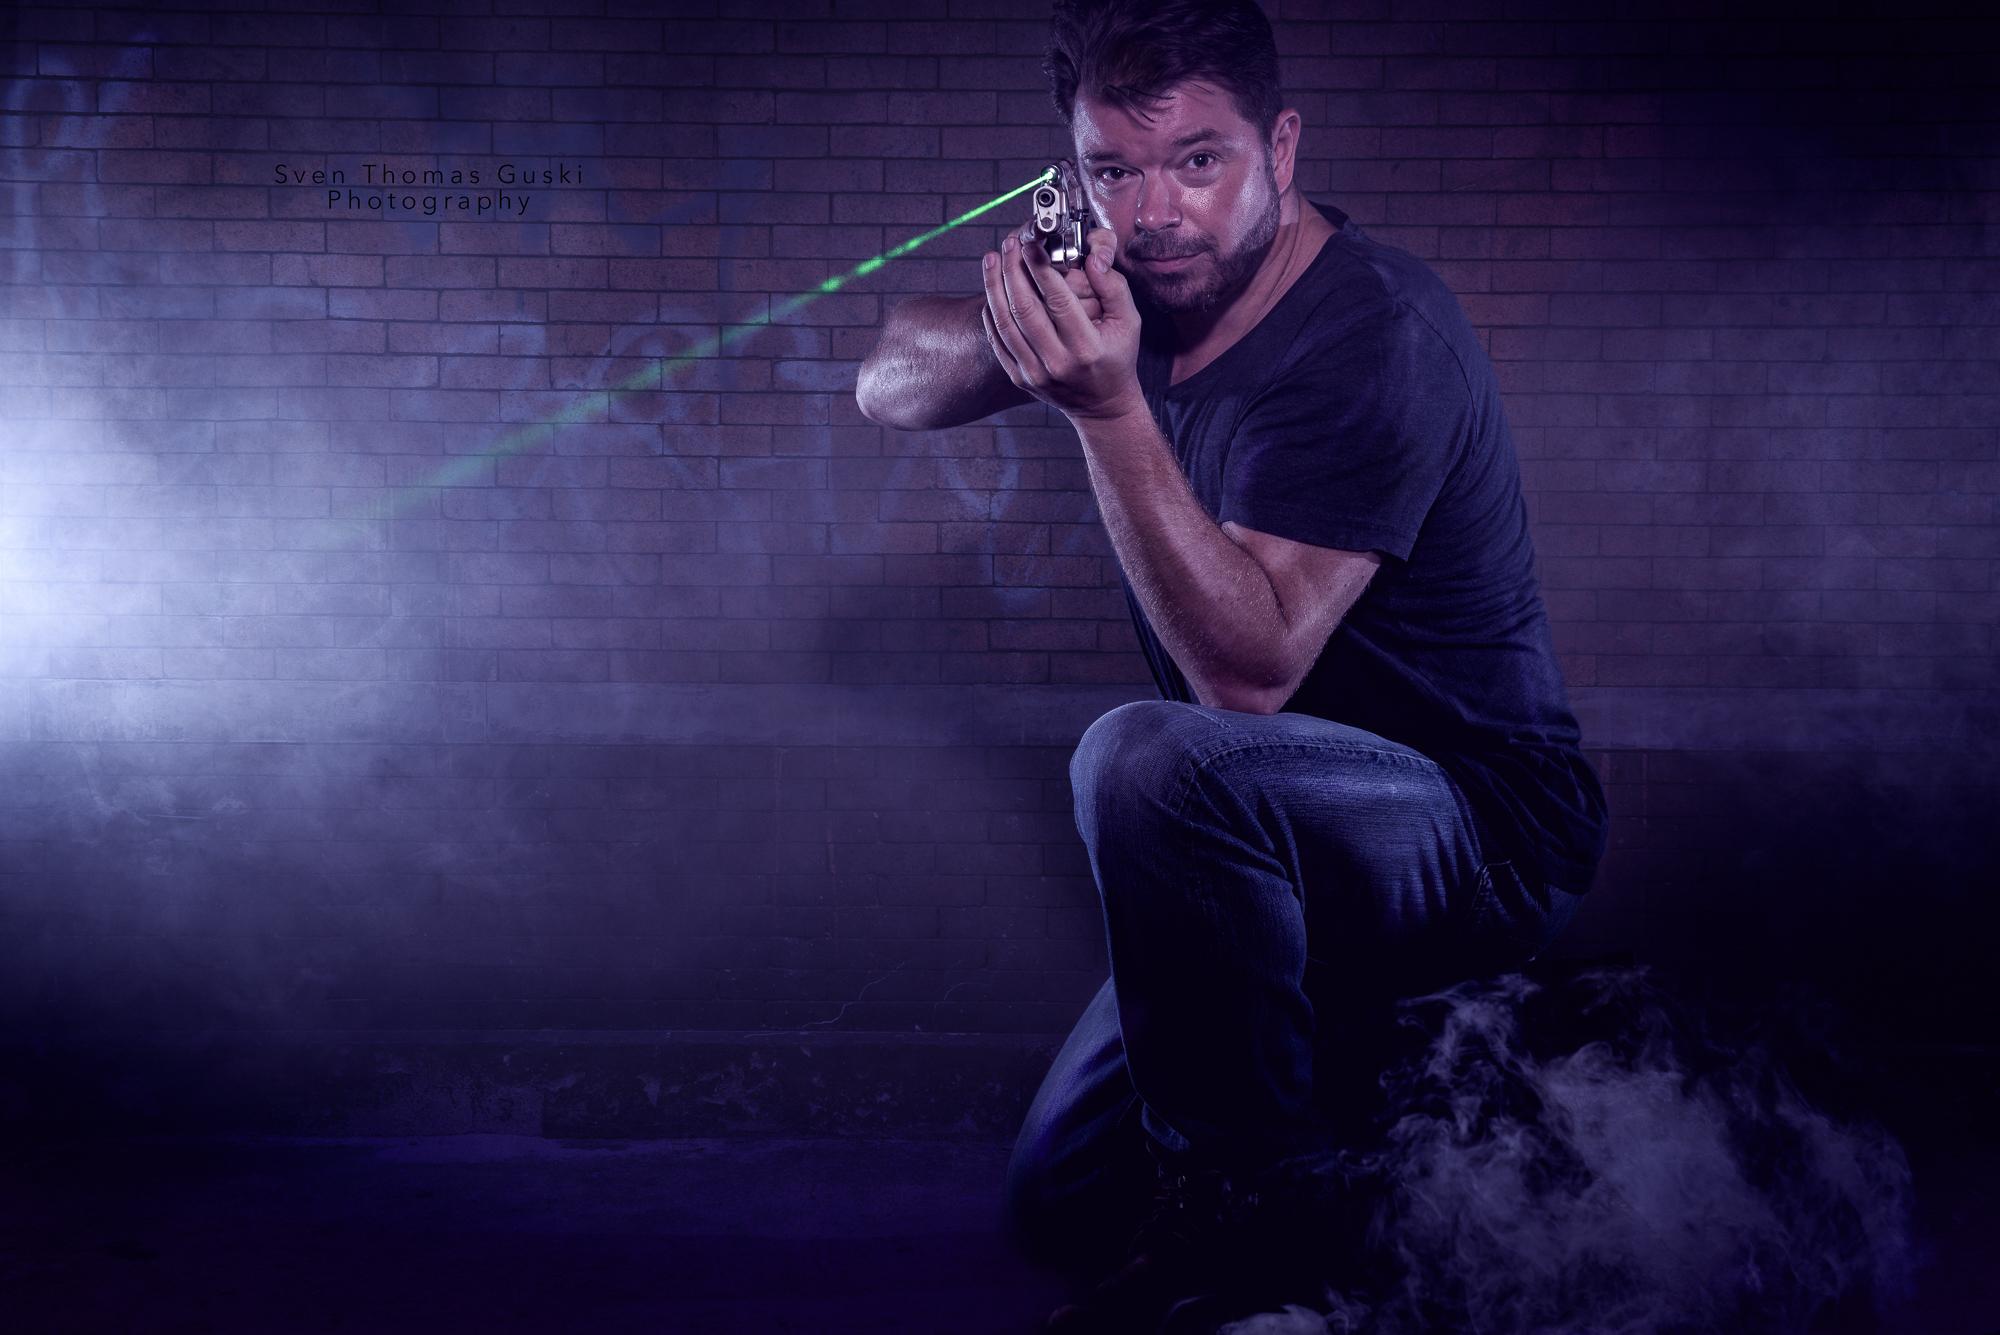 Agent-Shooting-290-Bearbeitet.jpg